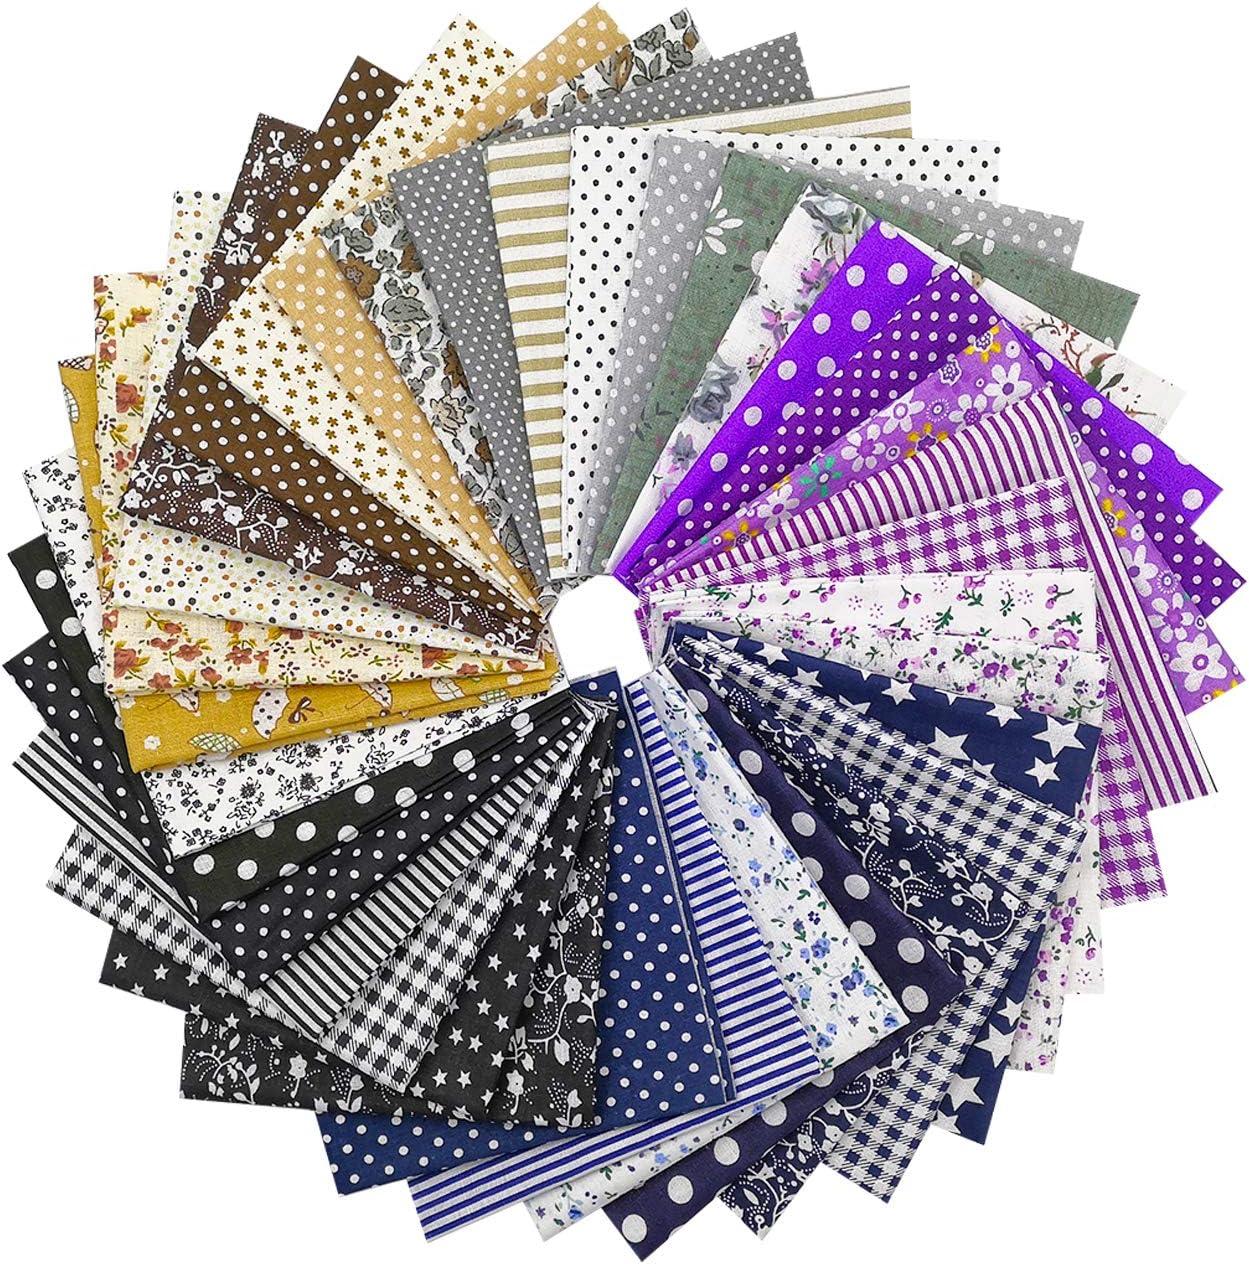 Misscrafts 50pcs 20 x 20cm Cotton Fabric Squares Bundle Patchwork Pre-Cut Quilt Squares for DIY Sewing Scrapbooking Quilting Dot Pattern Quilting Fabric